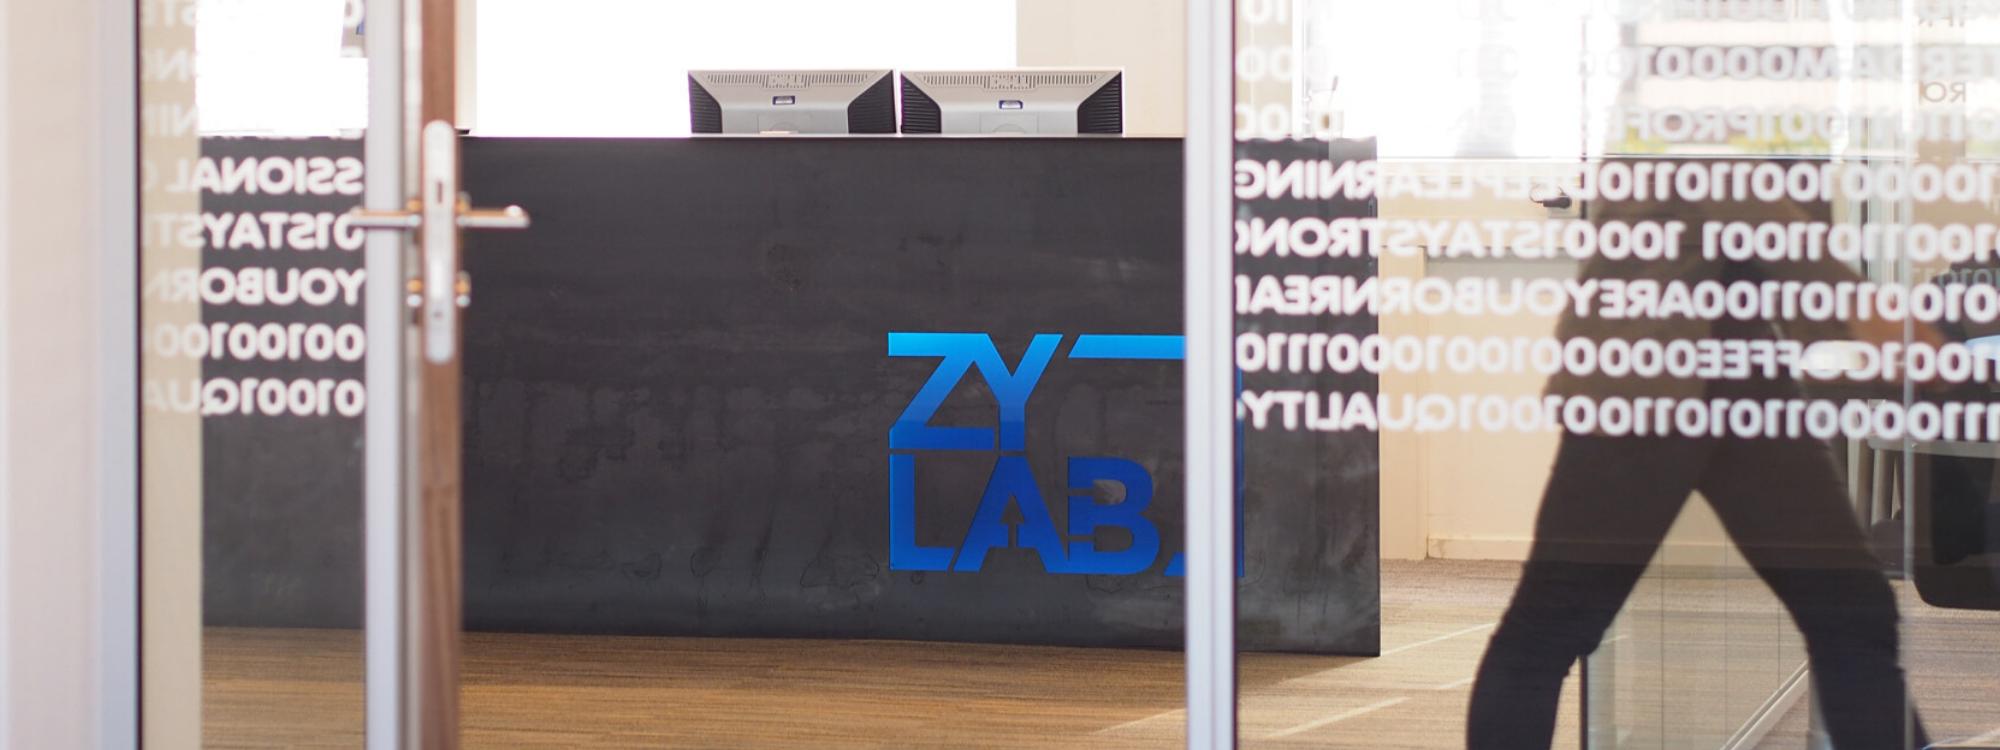 ZyLAB office banner